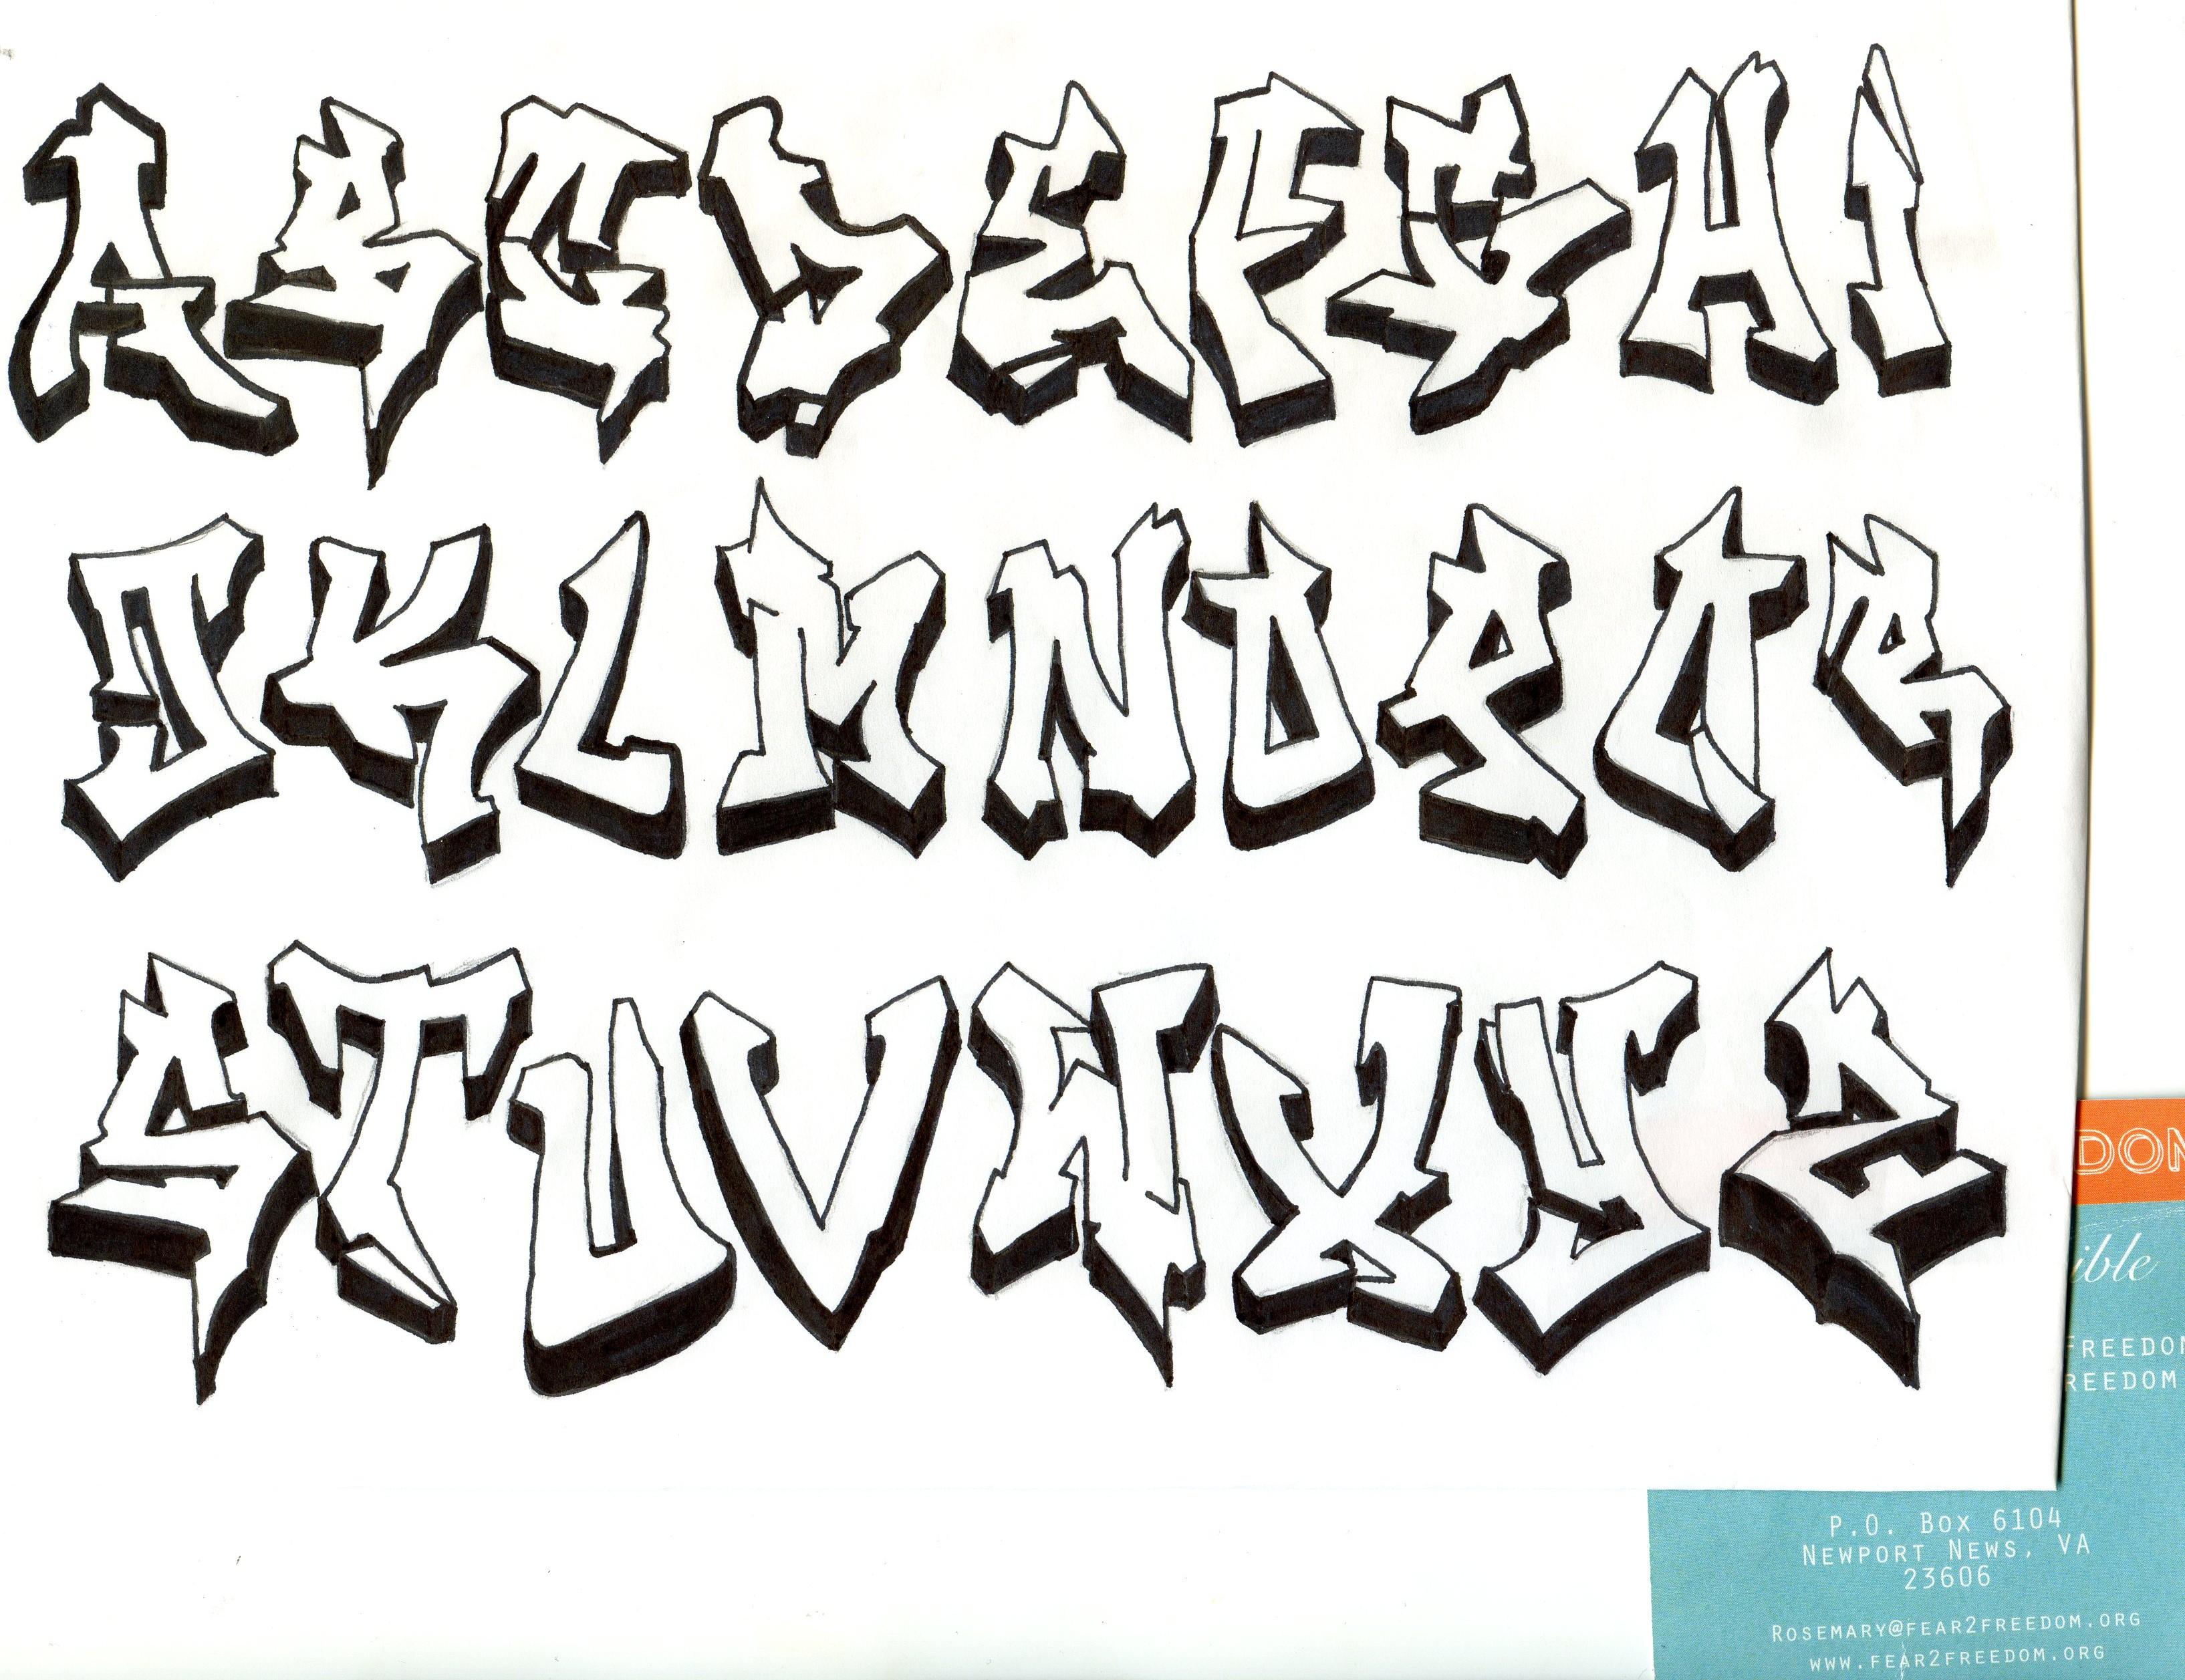 3269x2514 Wildstyle Graffiti Letters Alphabet Graffiti Letters 3d Graffiti